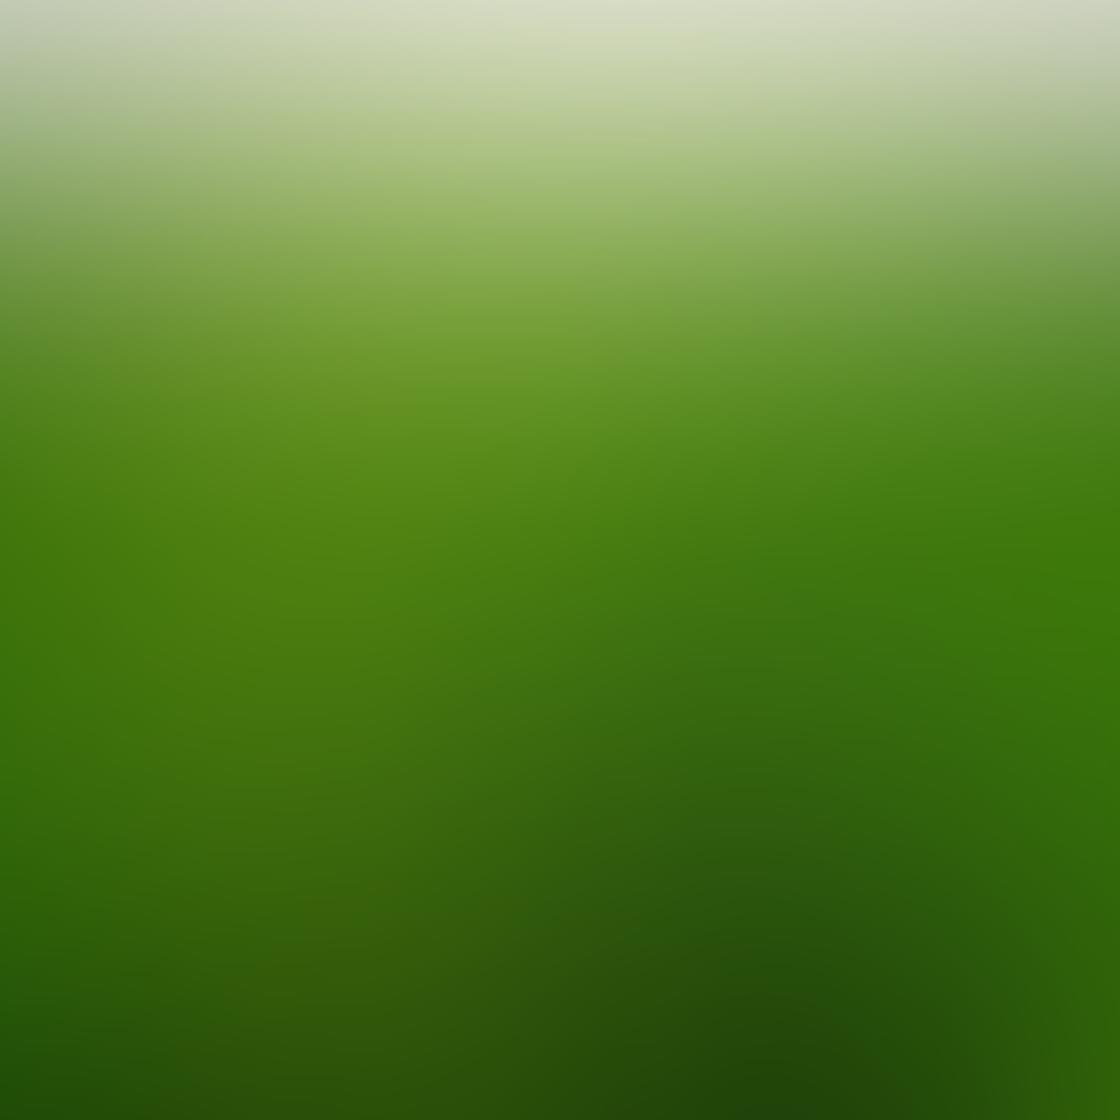 iPhone Photos of Plants 25